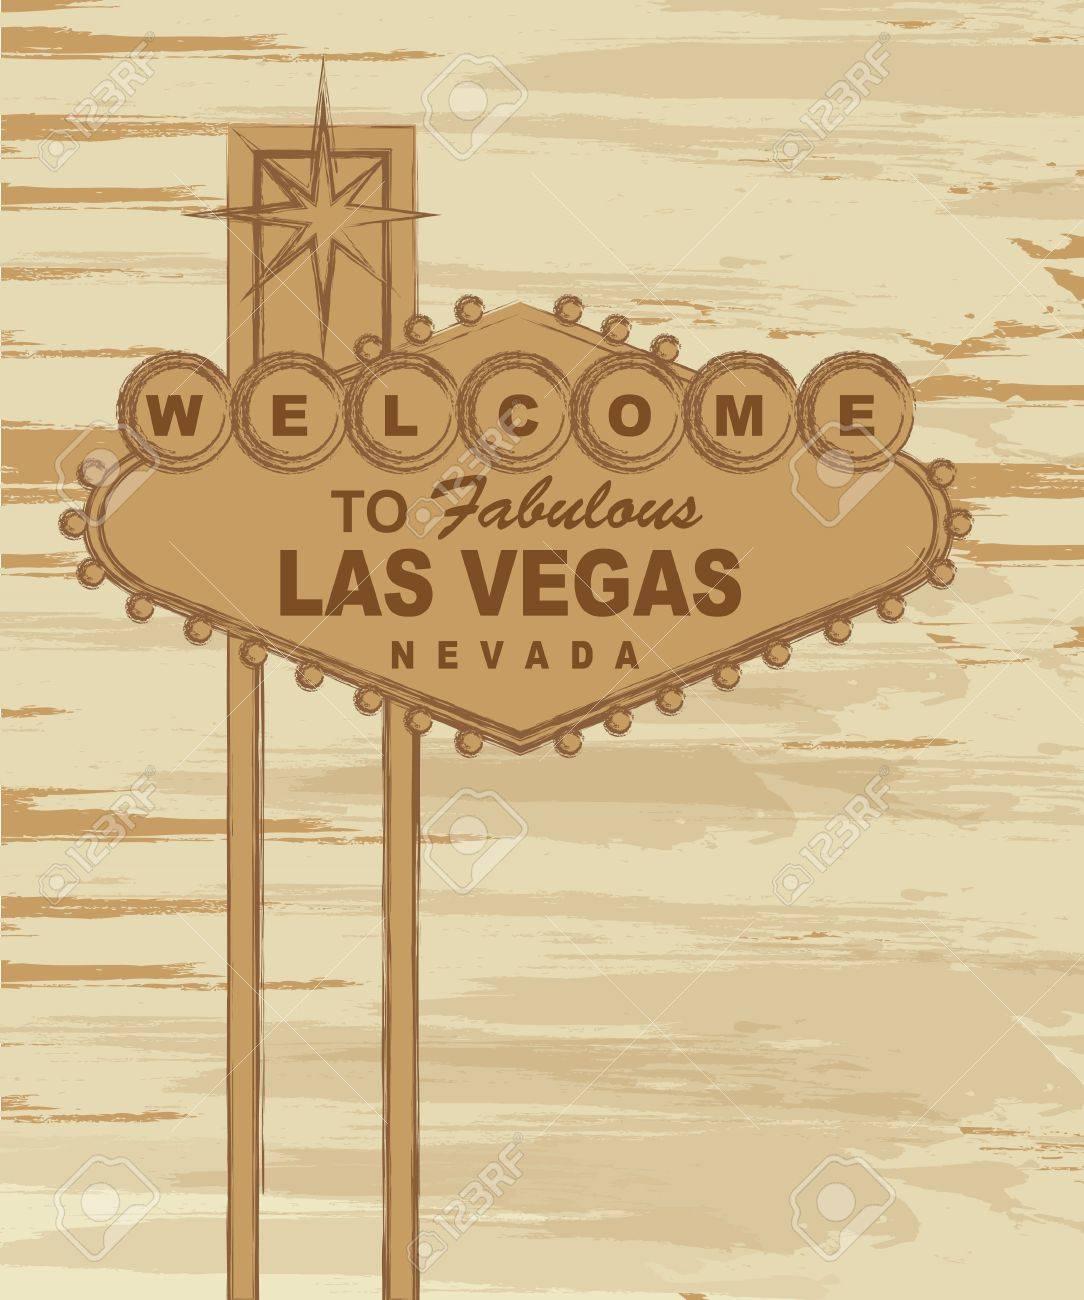 grunge welcome to fabulous las vegas nevada sign. vector Stock Vector - 13216435